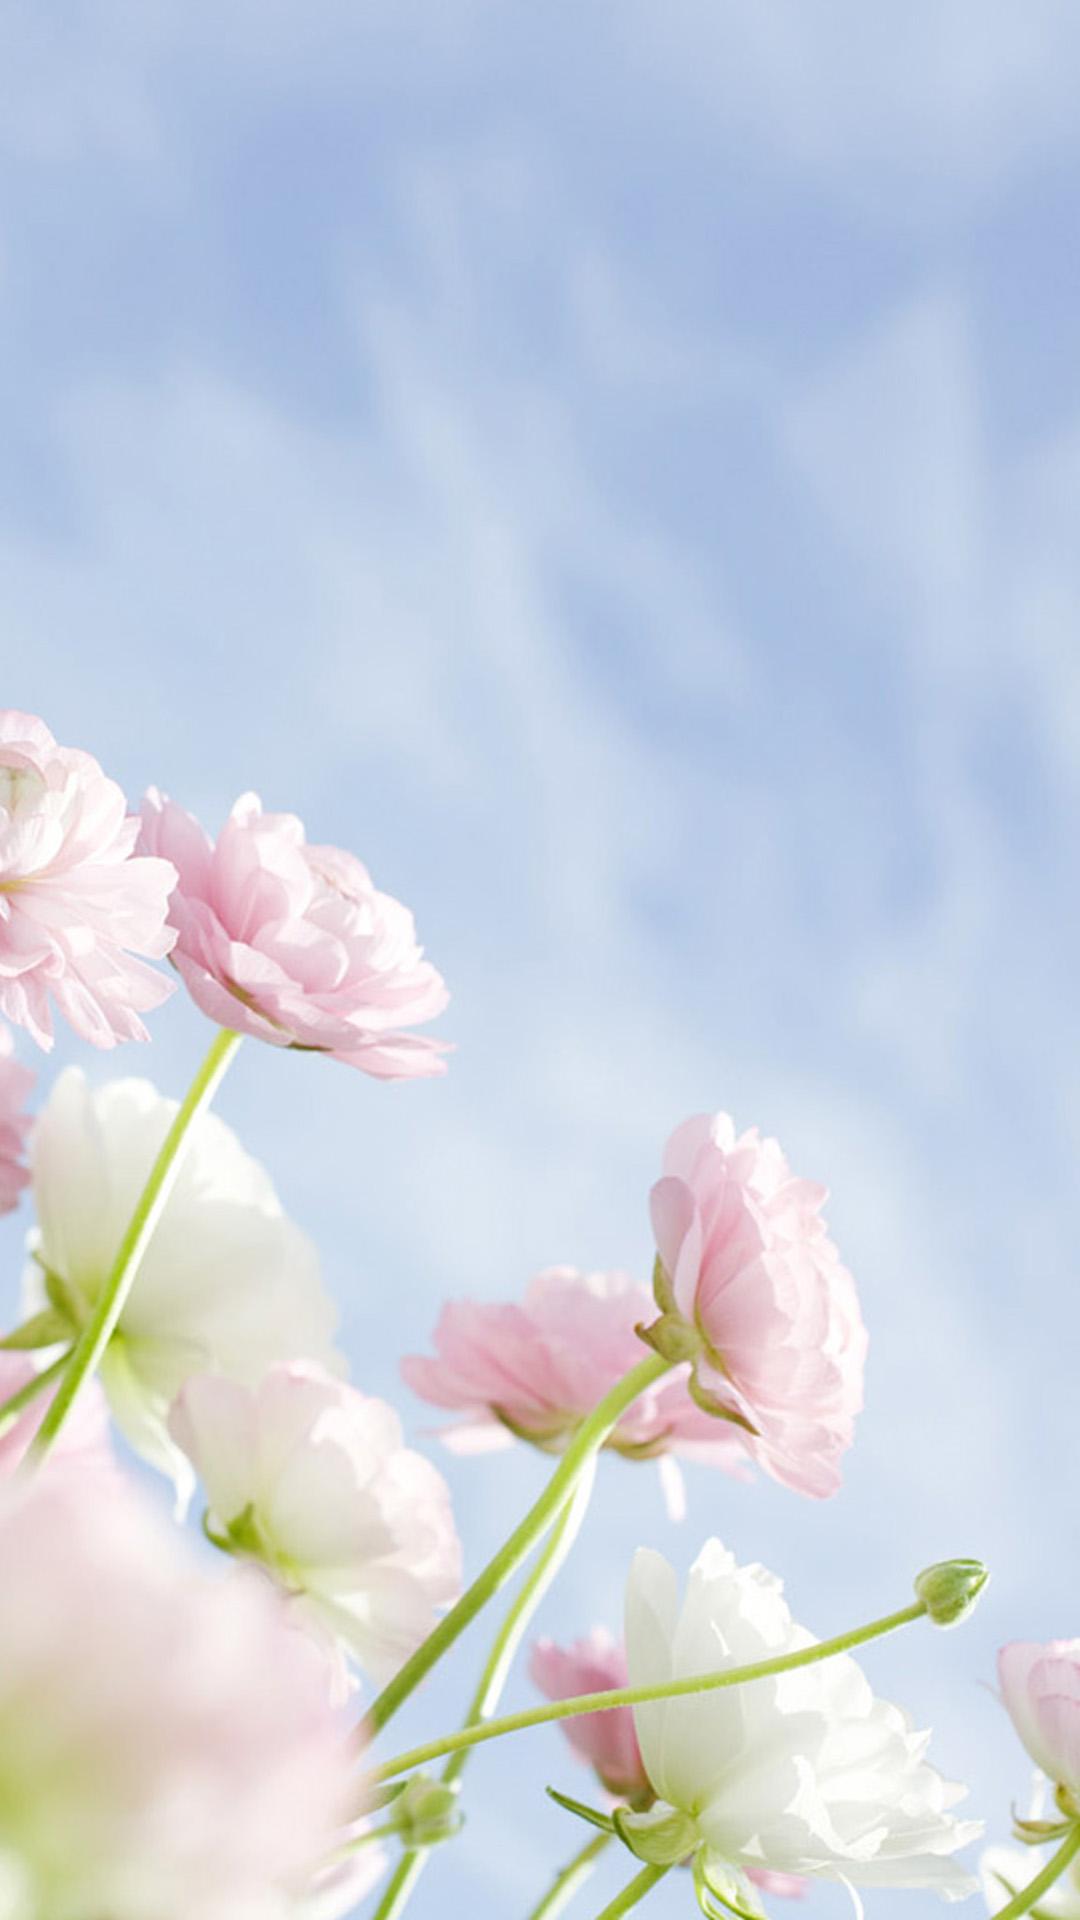 Elegant Flowers Galaxy S5 Wallpapers Samsung Galaxy - Samsung S5 Wallpaper Flower - HD Wallpaper